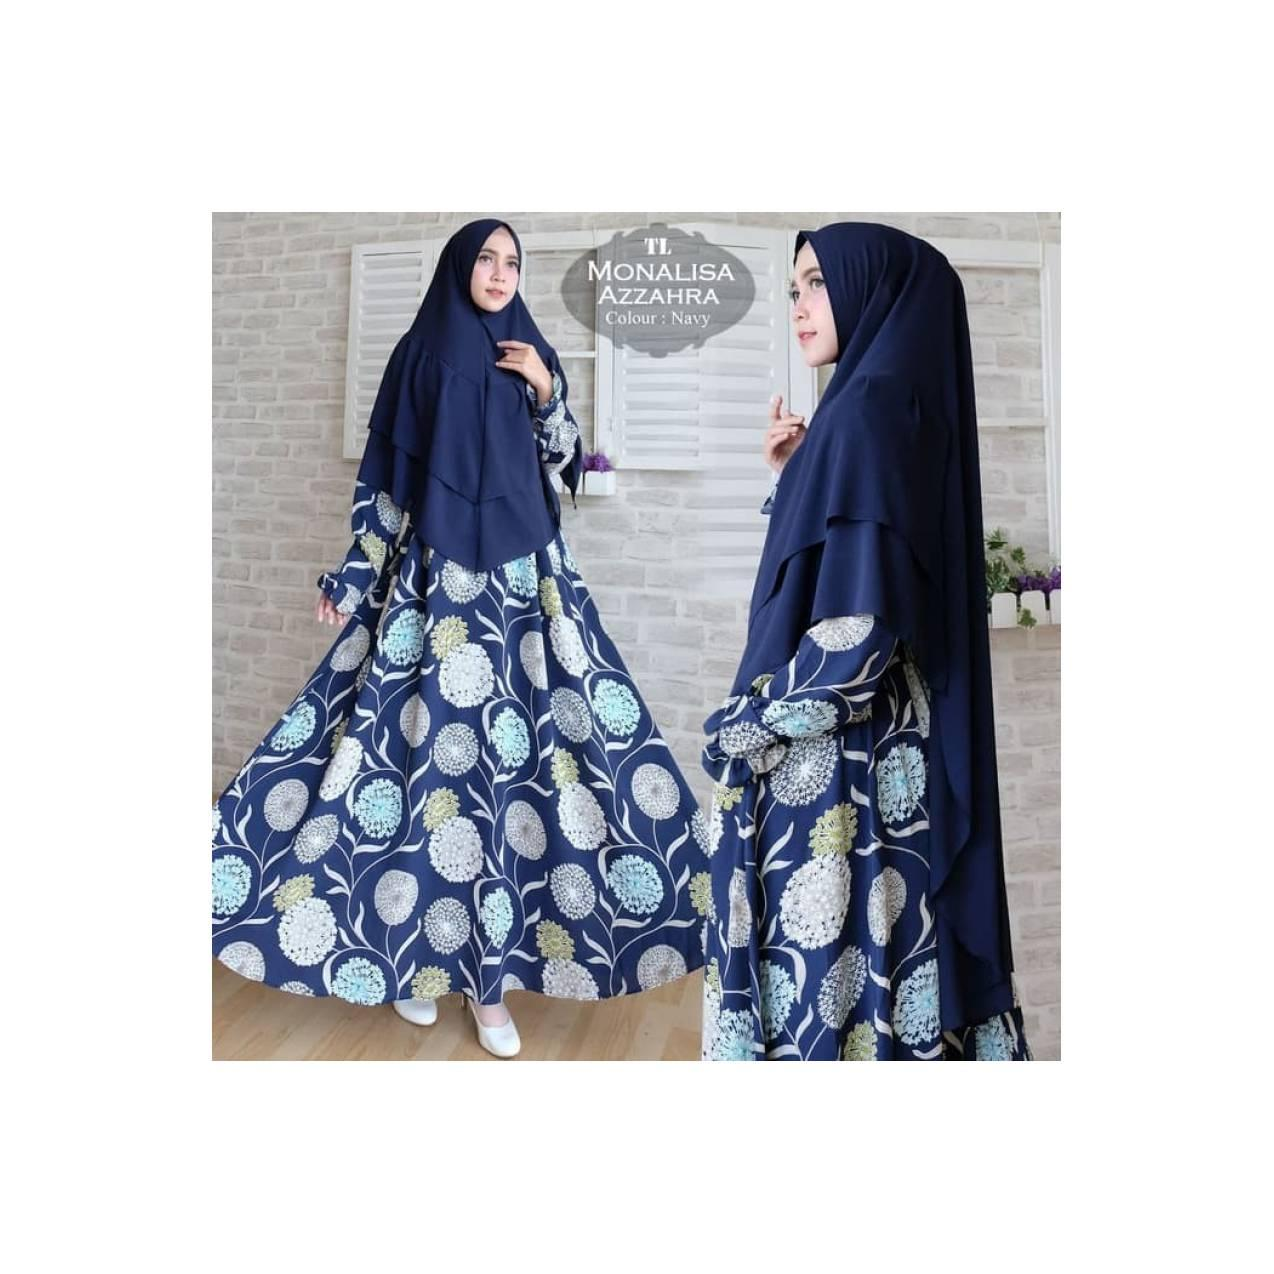 baju muslim biru navy dress gamis xxxl jumbo bigsize pesta xxl 2xl 3xl